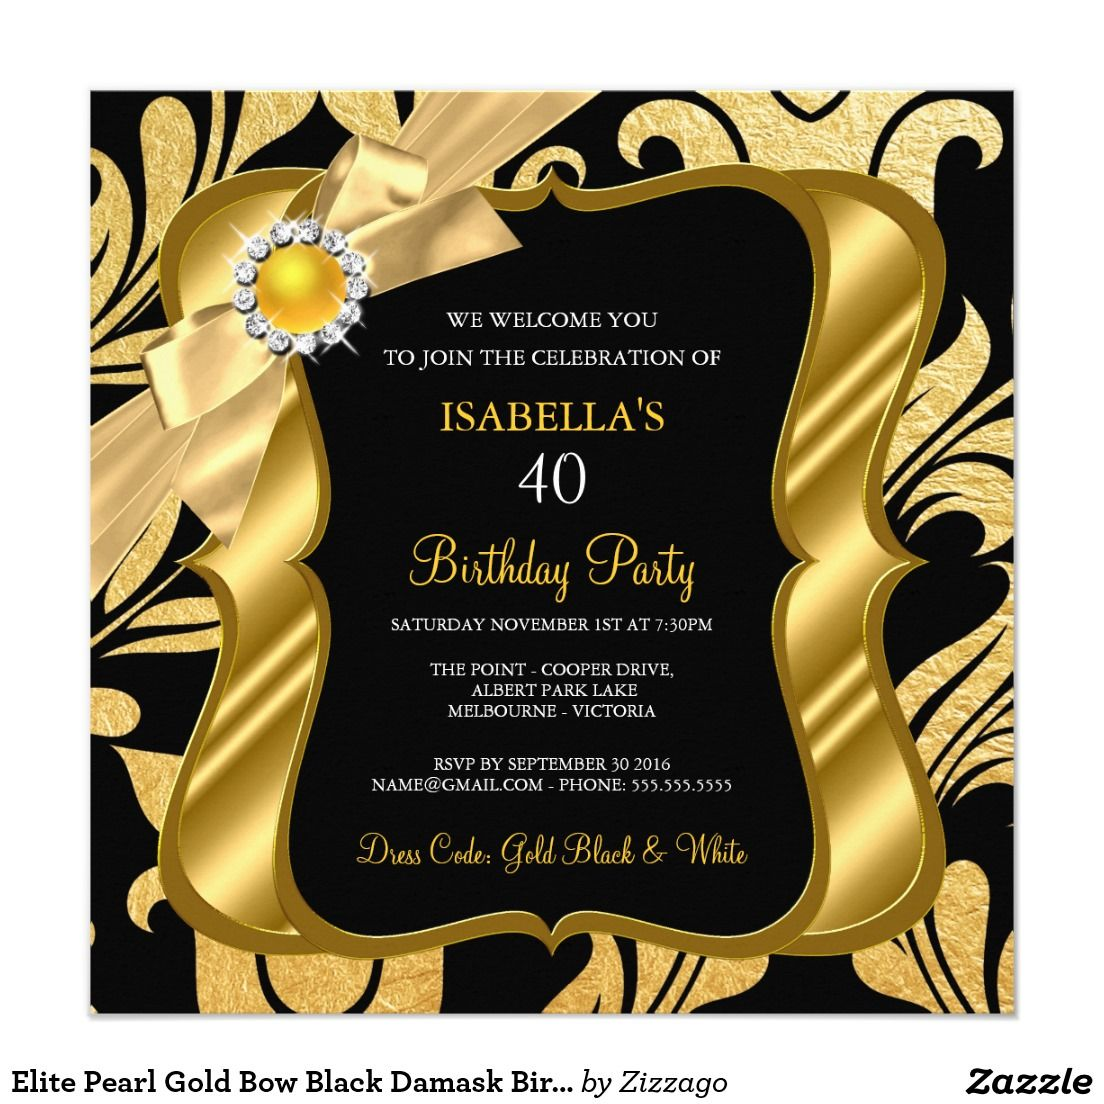 Elite Pearl Gold Bow Black Damask Birthday Invite | Damasks ...